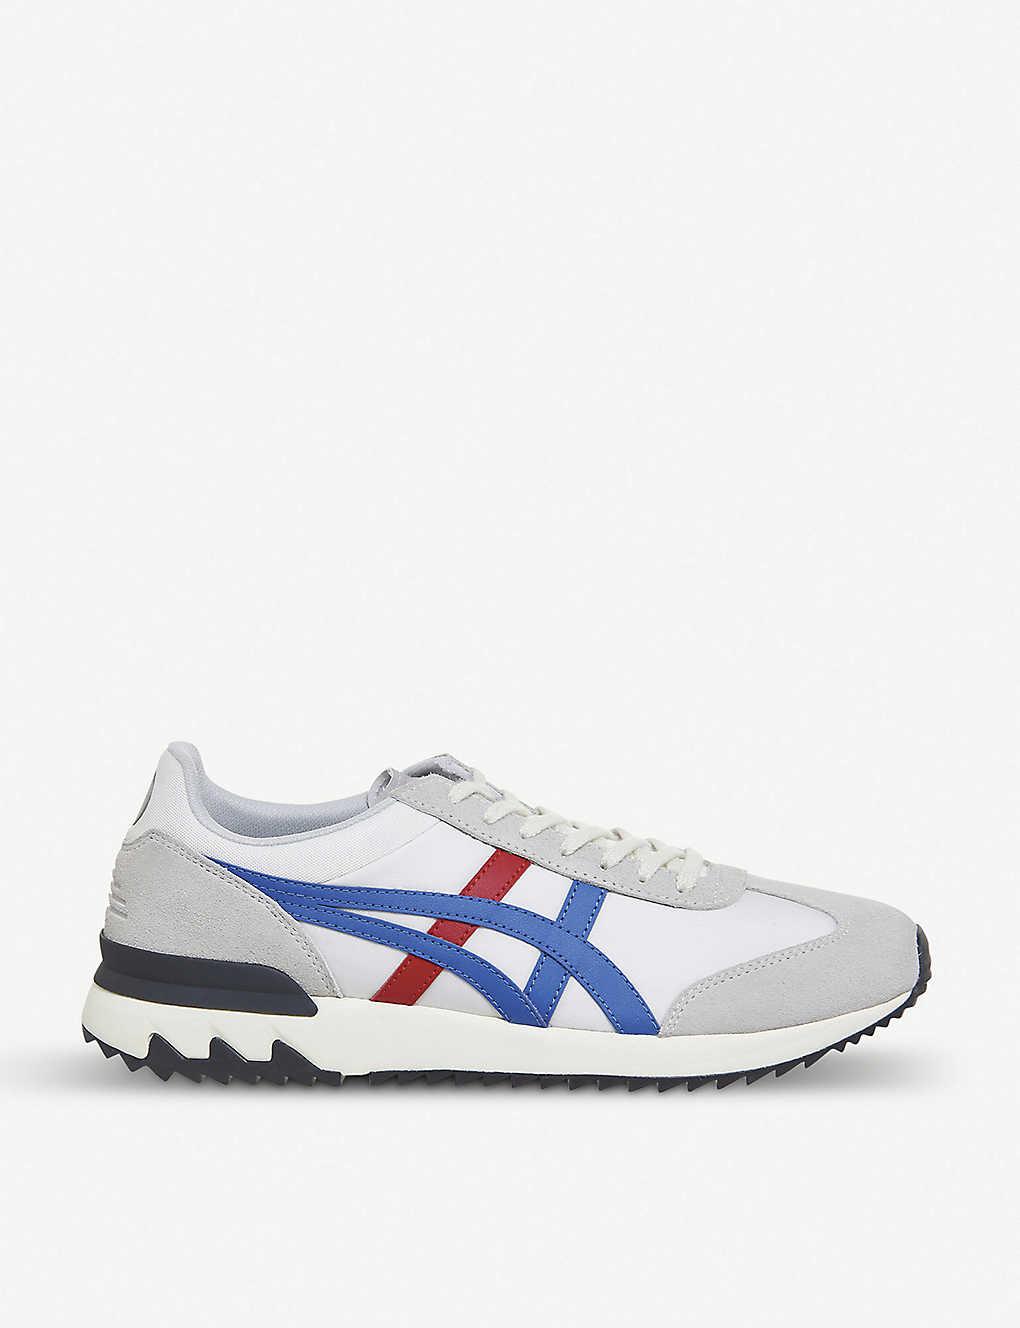 3cfbc9e98a5 ASICS - California 78 Ex suede and nylon sneakers